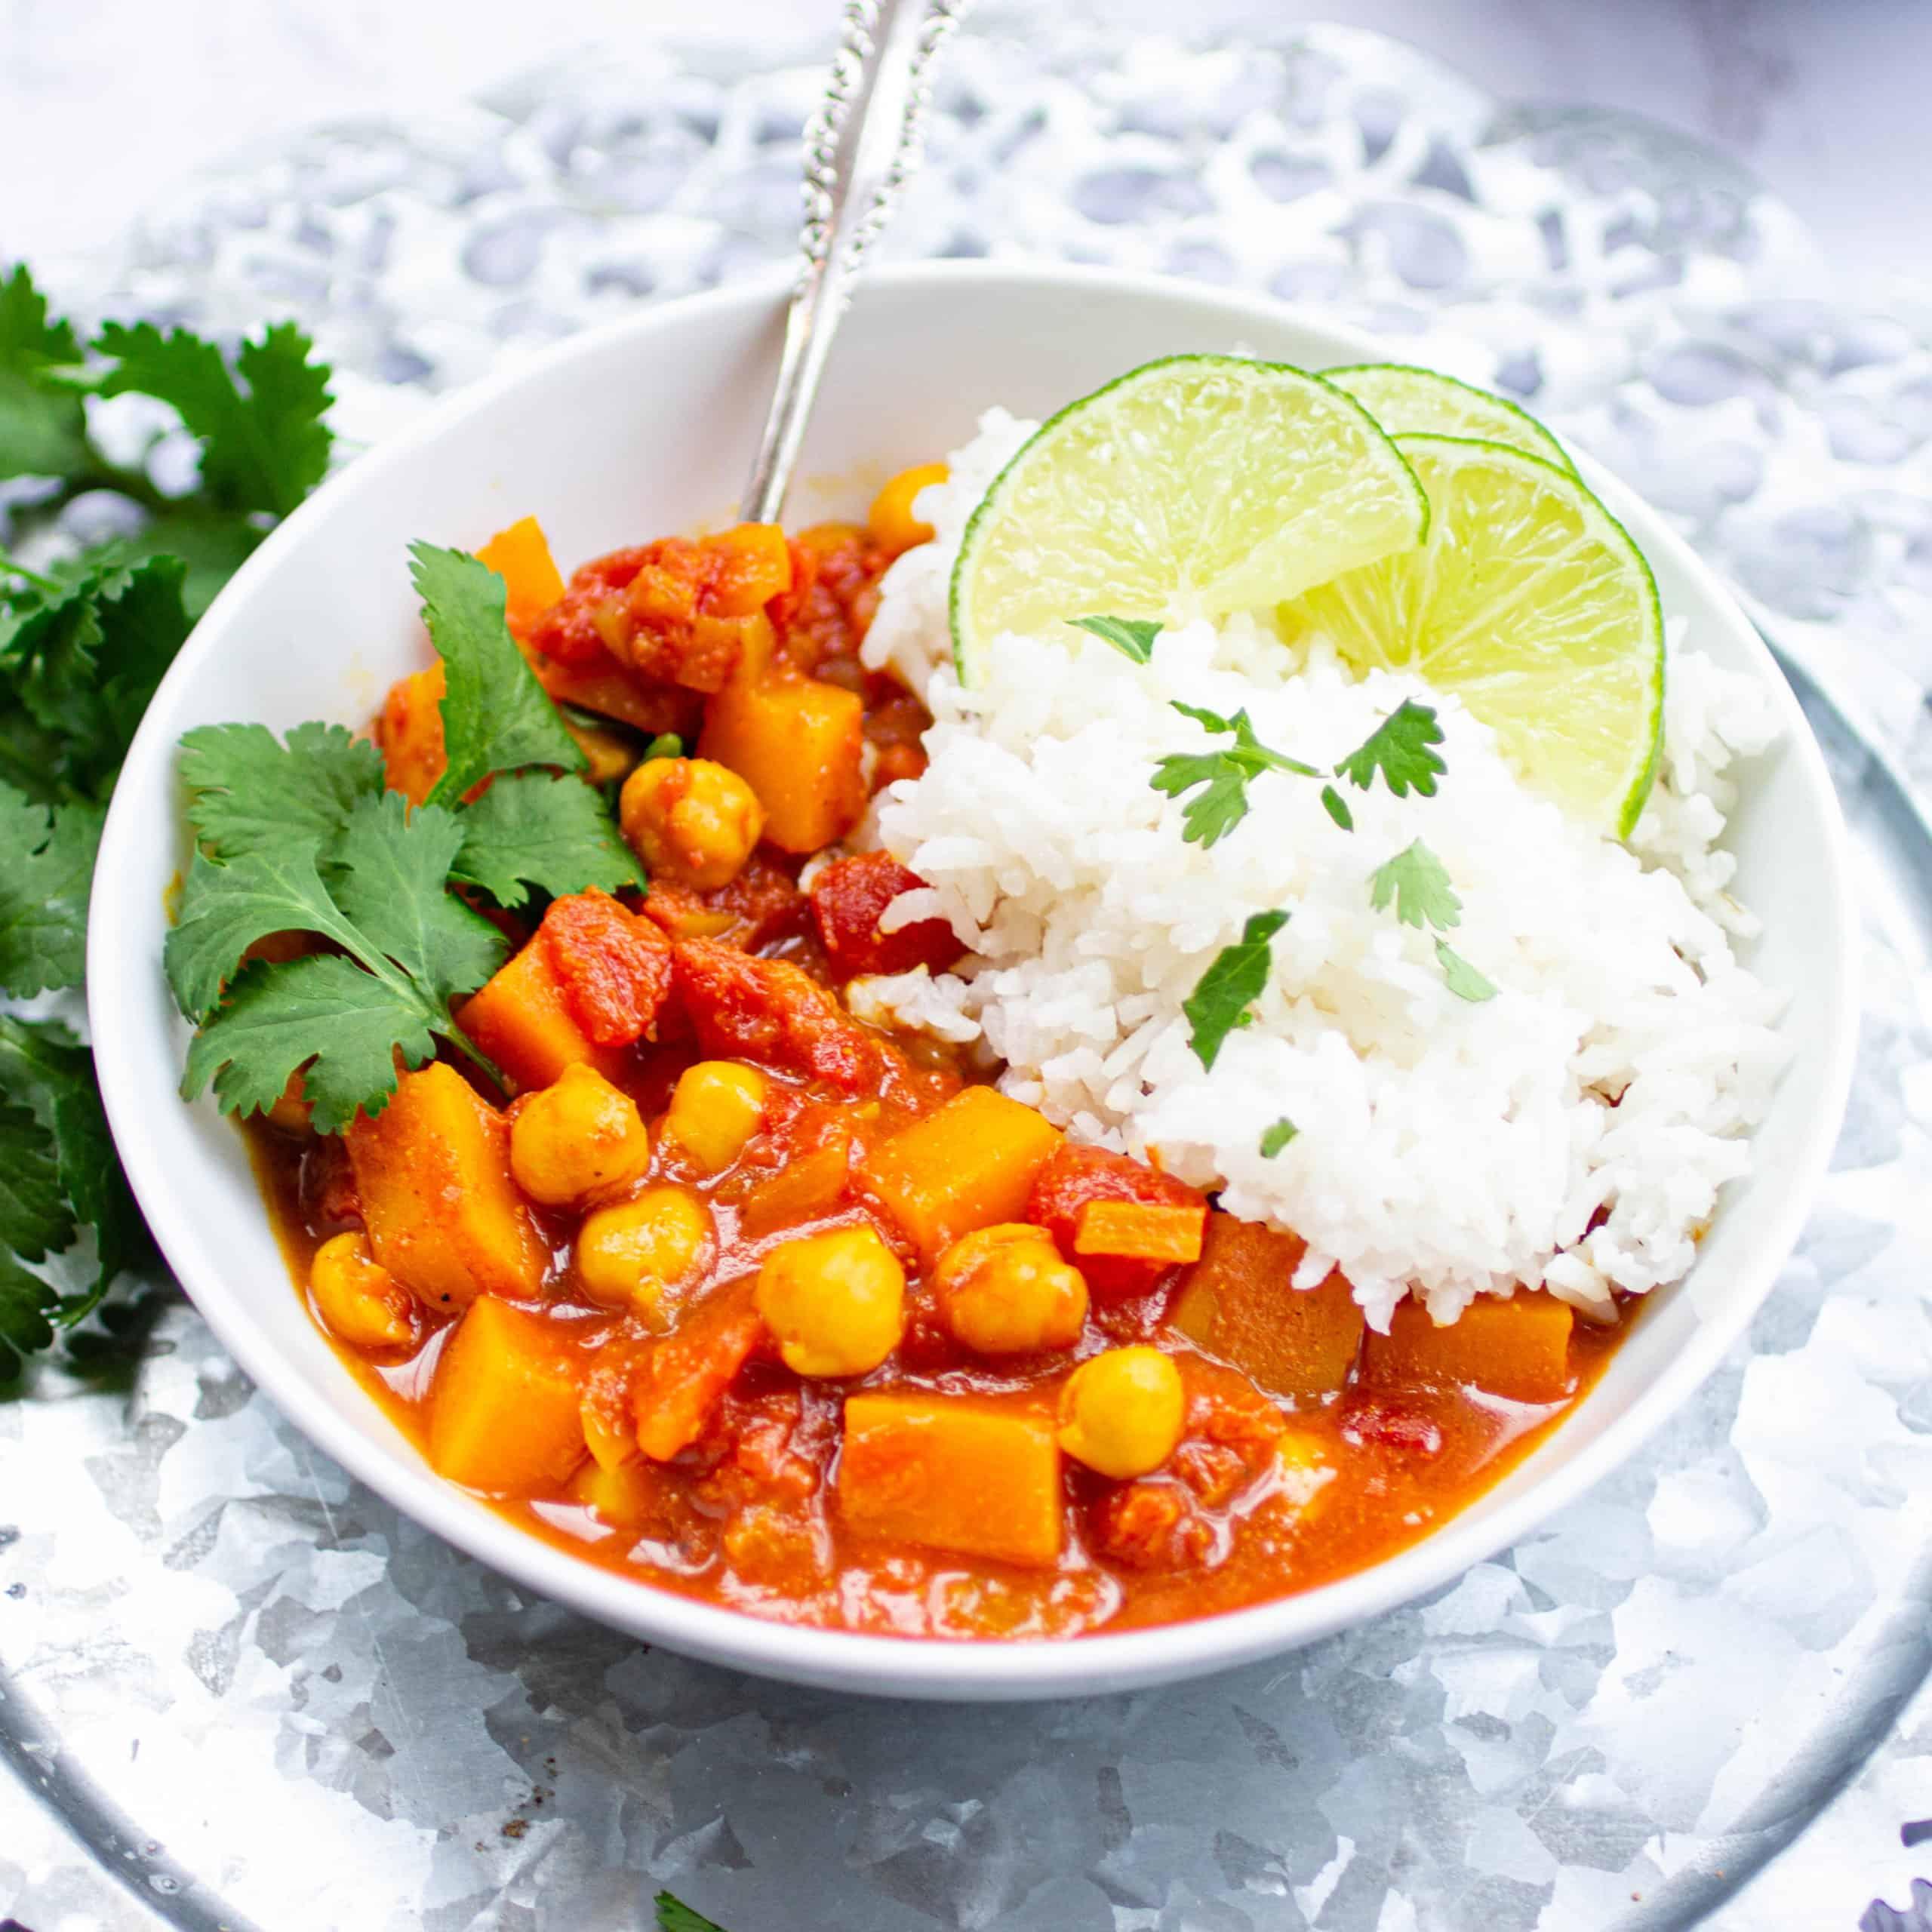 Vegan Moroccan Tagine